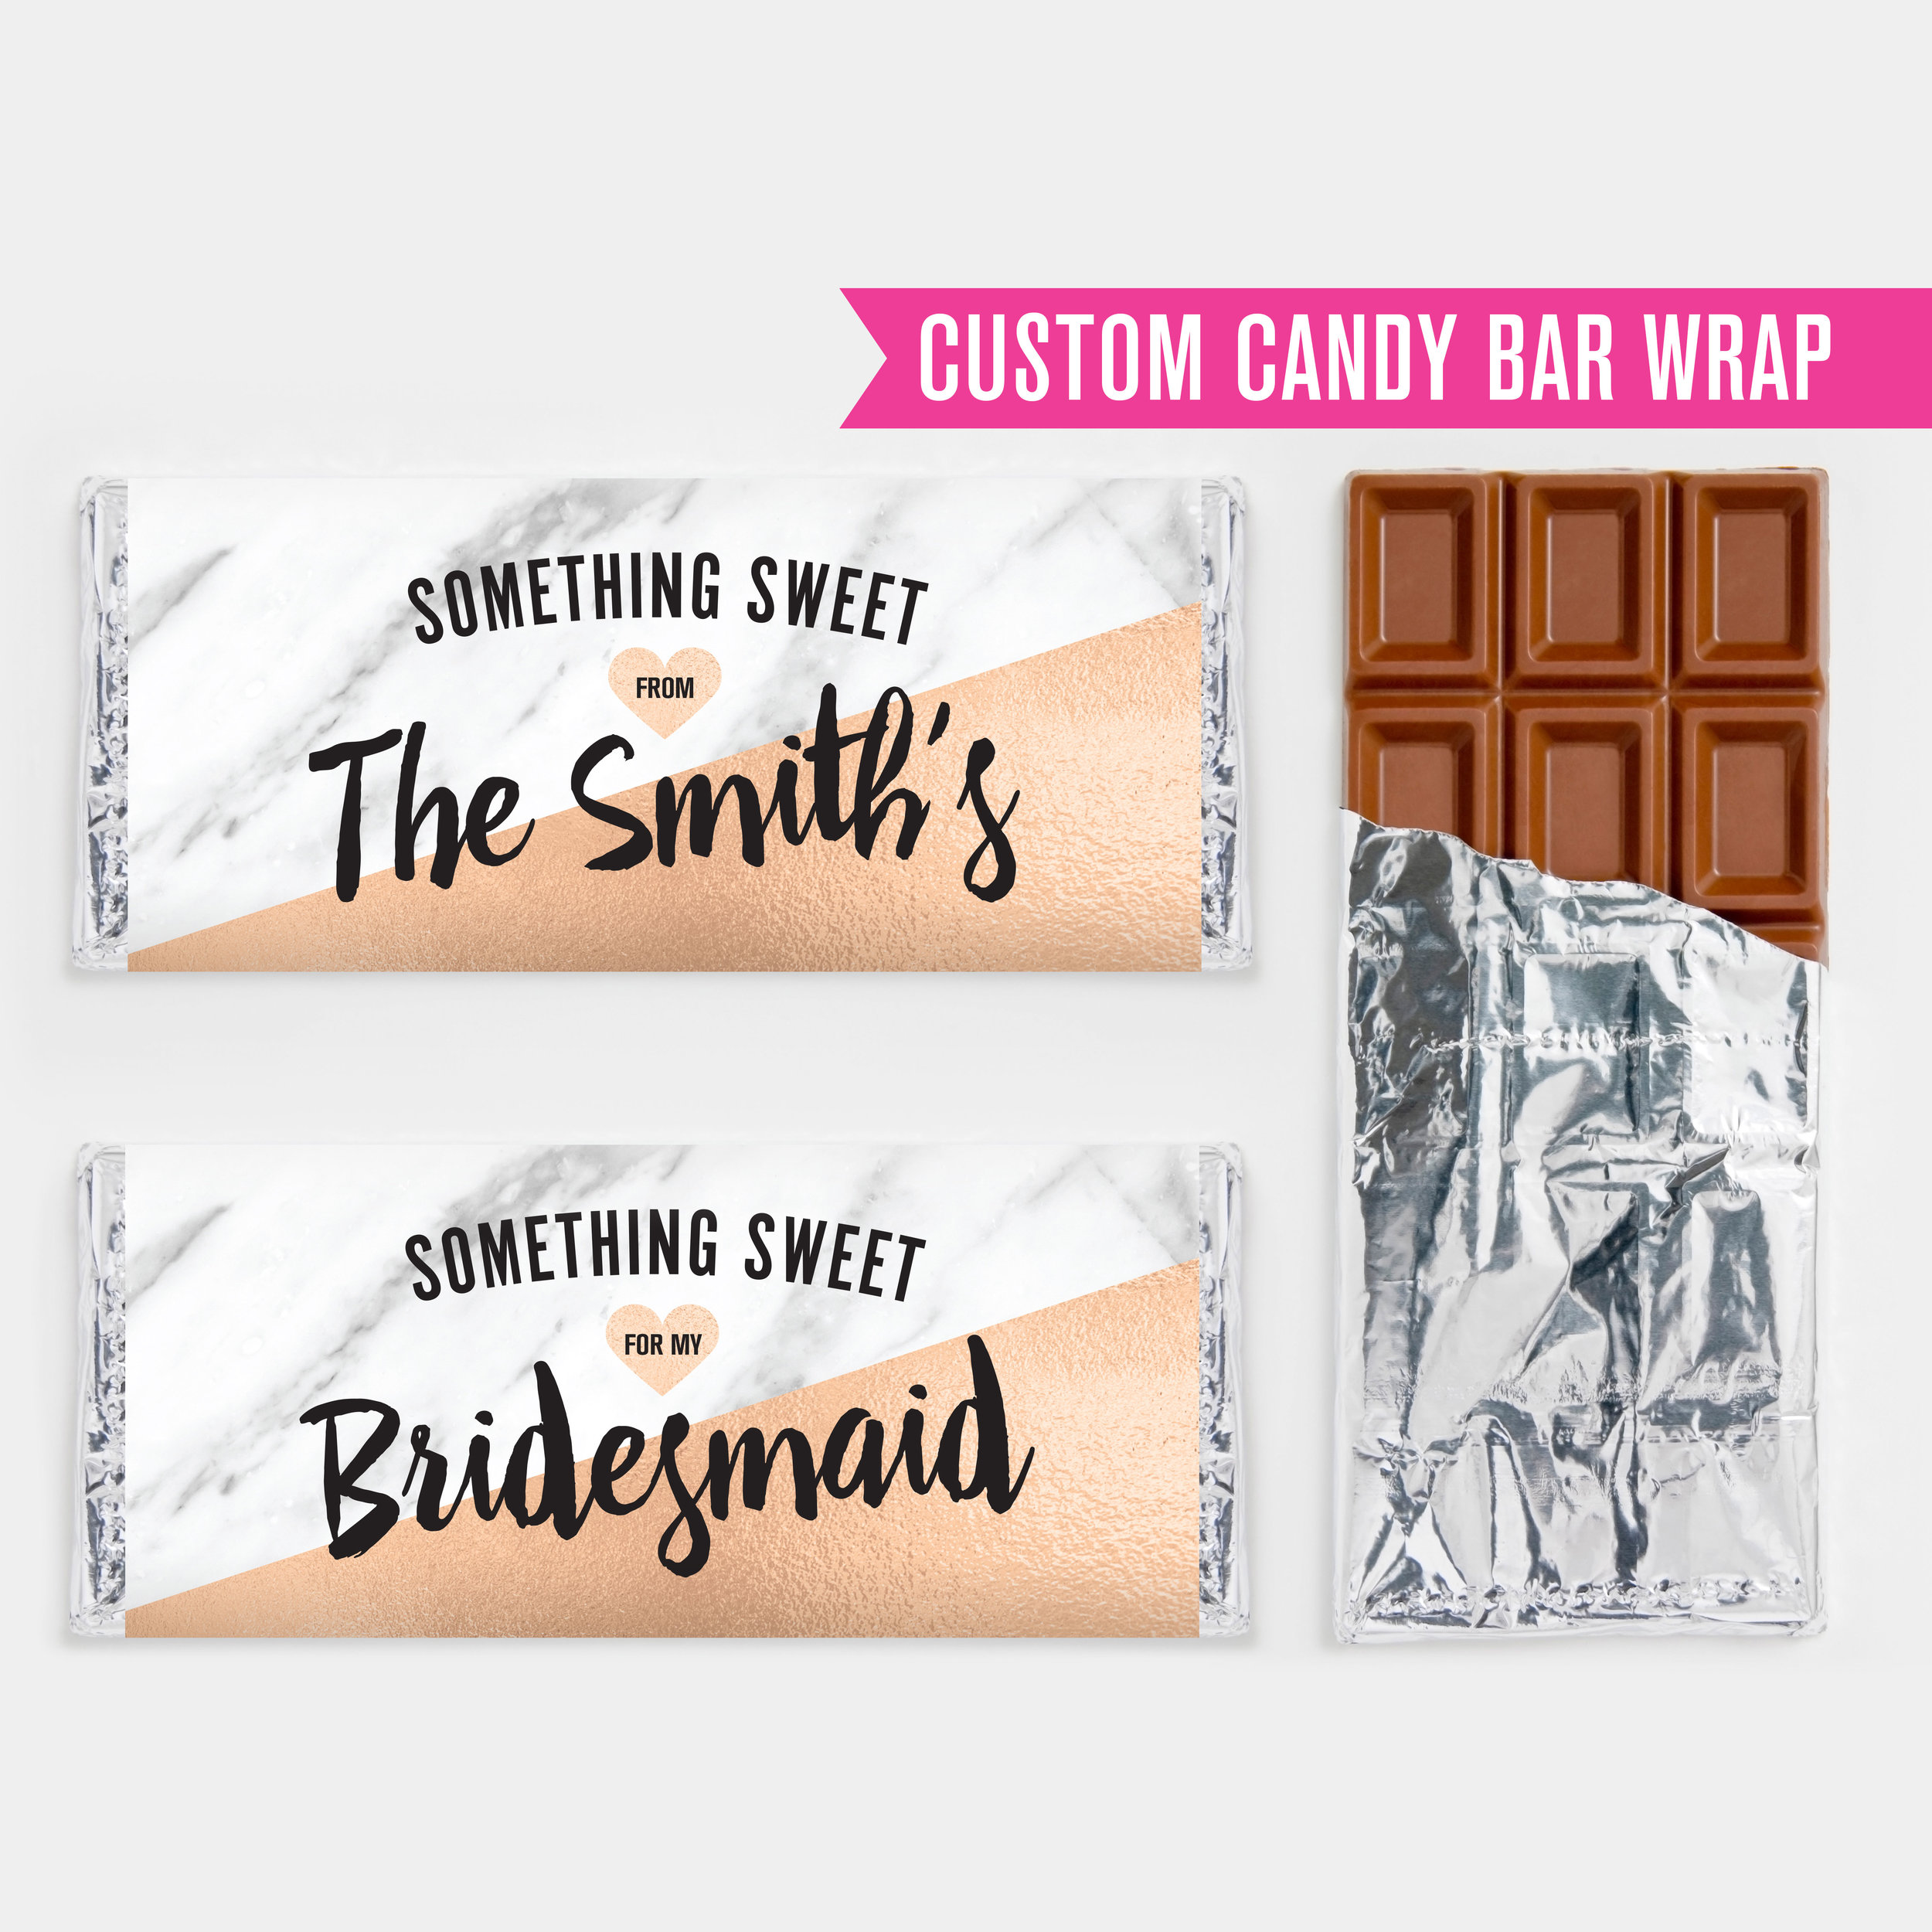 Custom Candy Bar Wraps